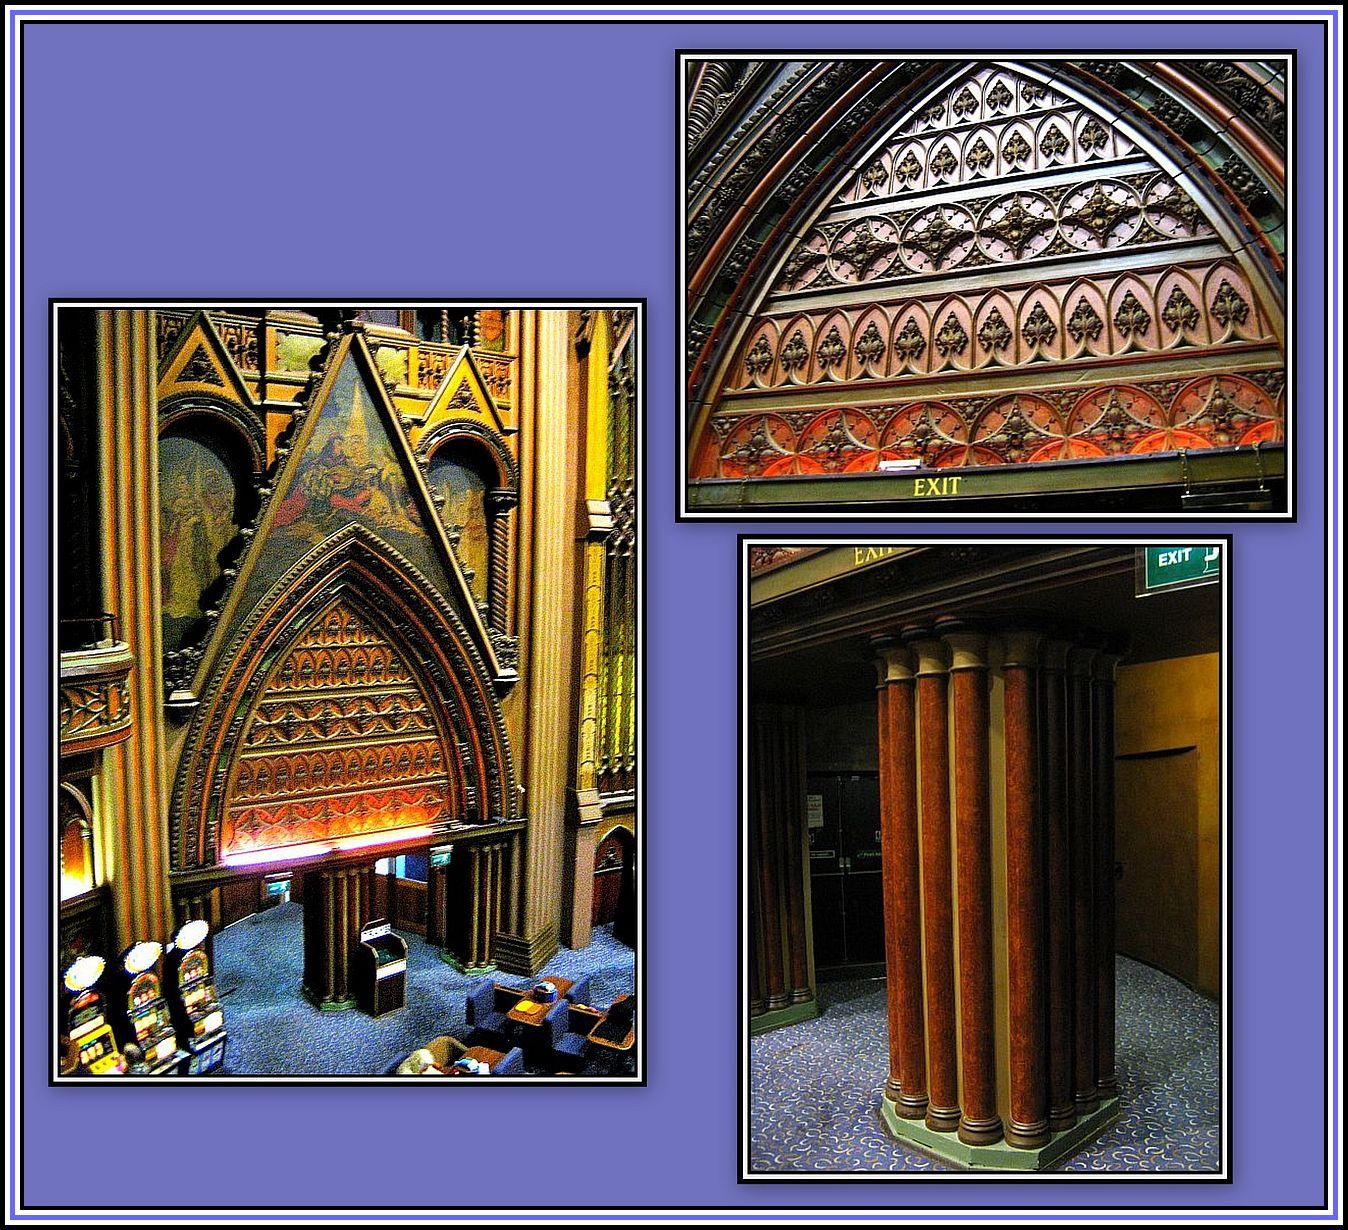 Goth Arch detail - collage